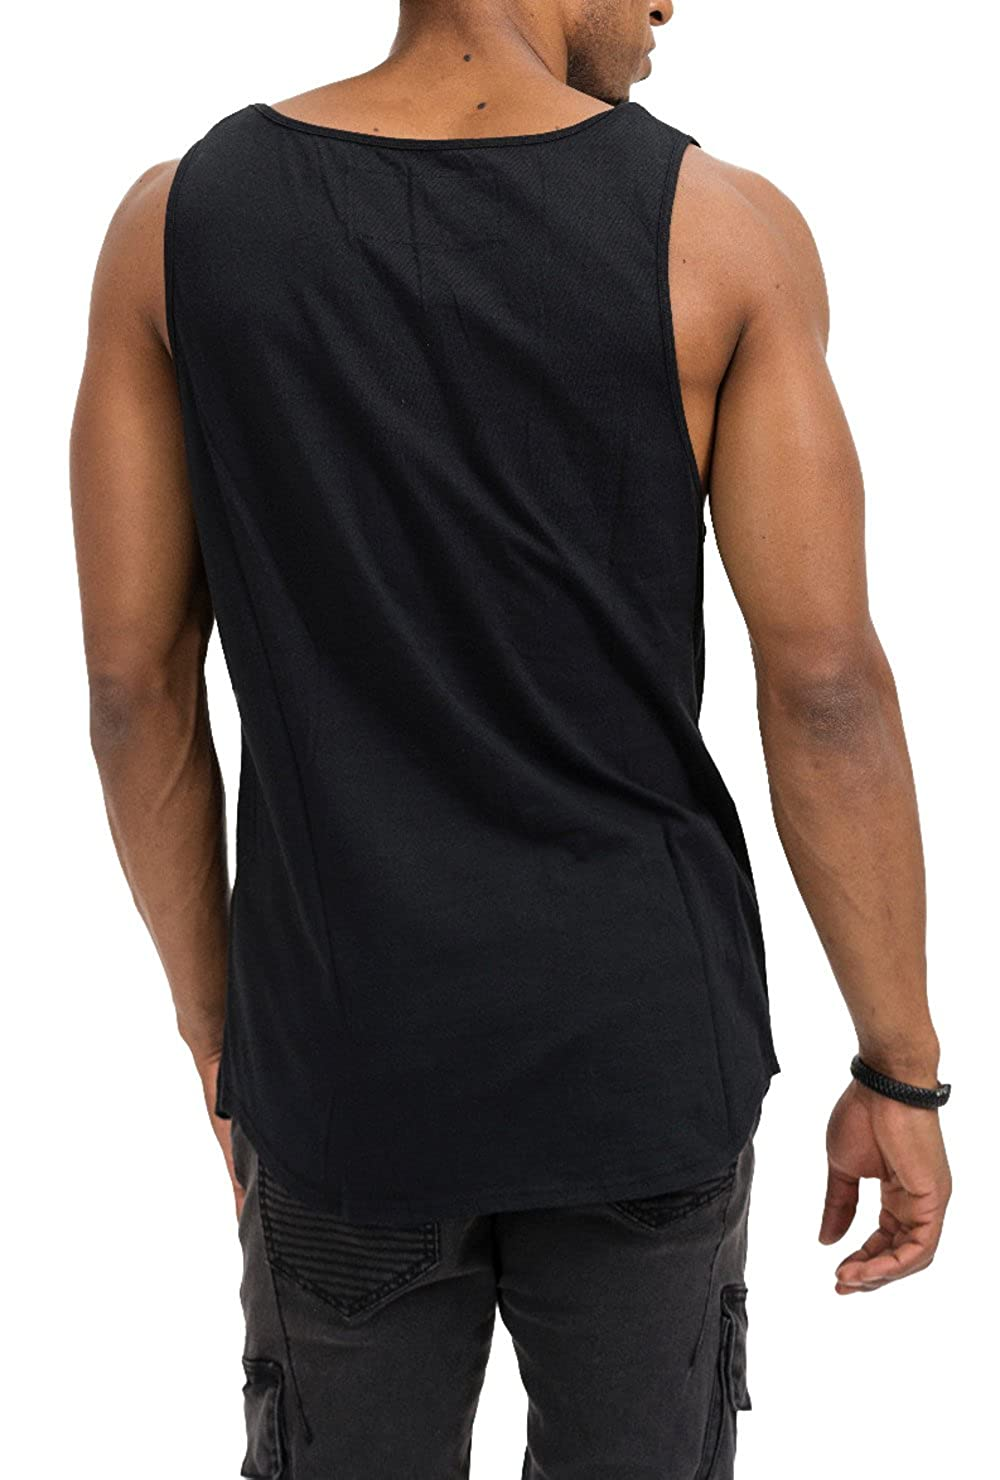 trueprodigy Casual Hombre Marca Camiseta De Tirantes Basico Ropa ... bcc8adabb5a